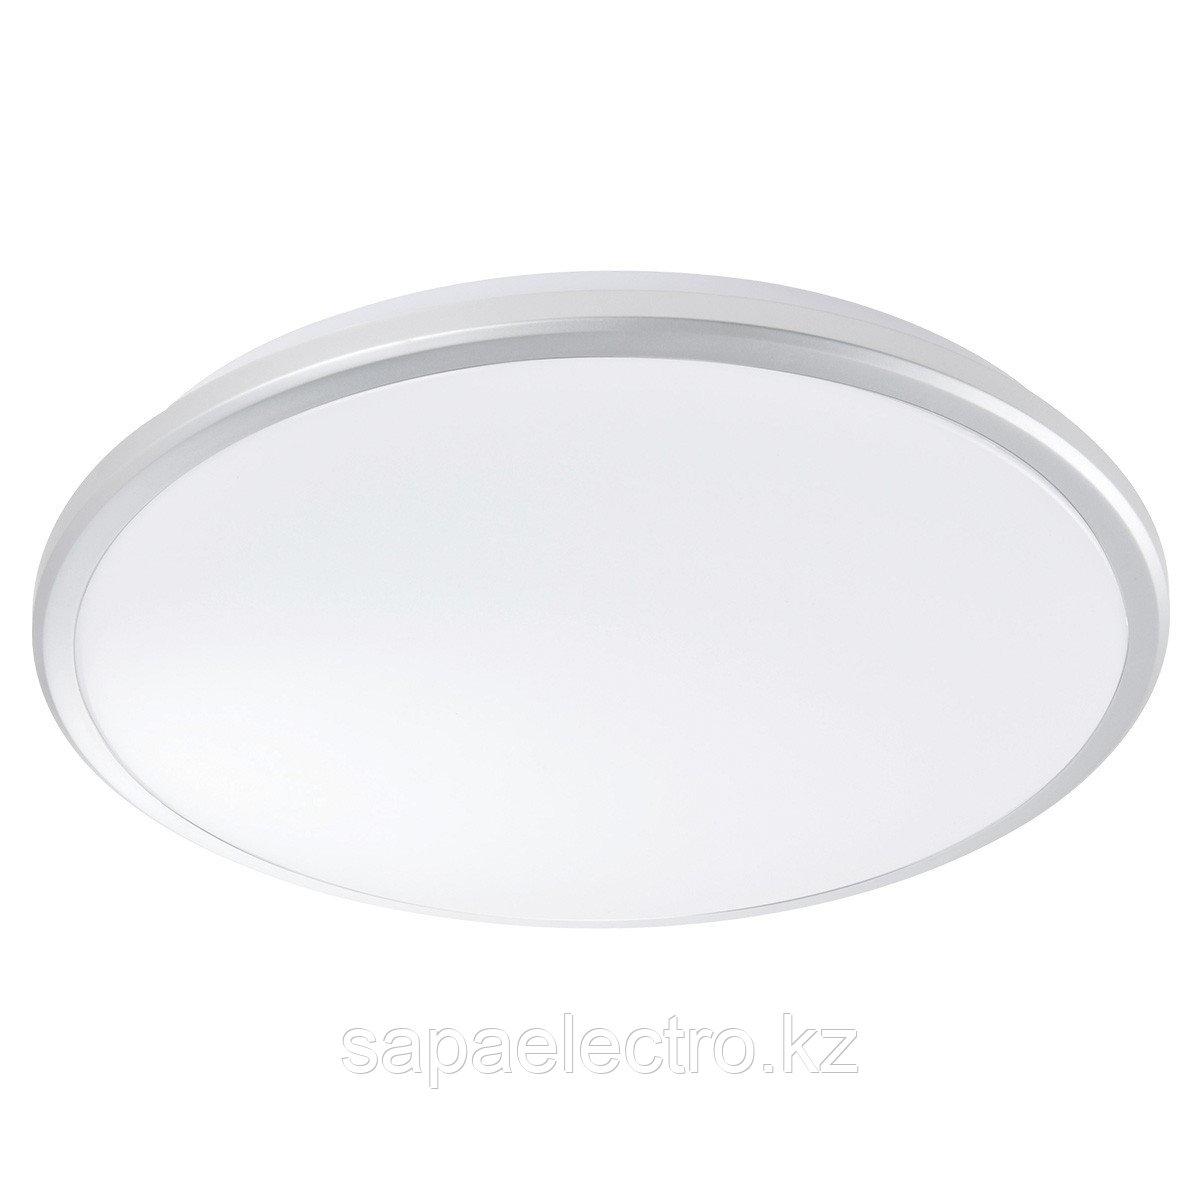 Свет-к RONDO LED 24W 5500K   (TEKSAN) 8шт